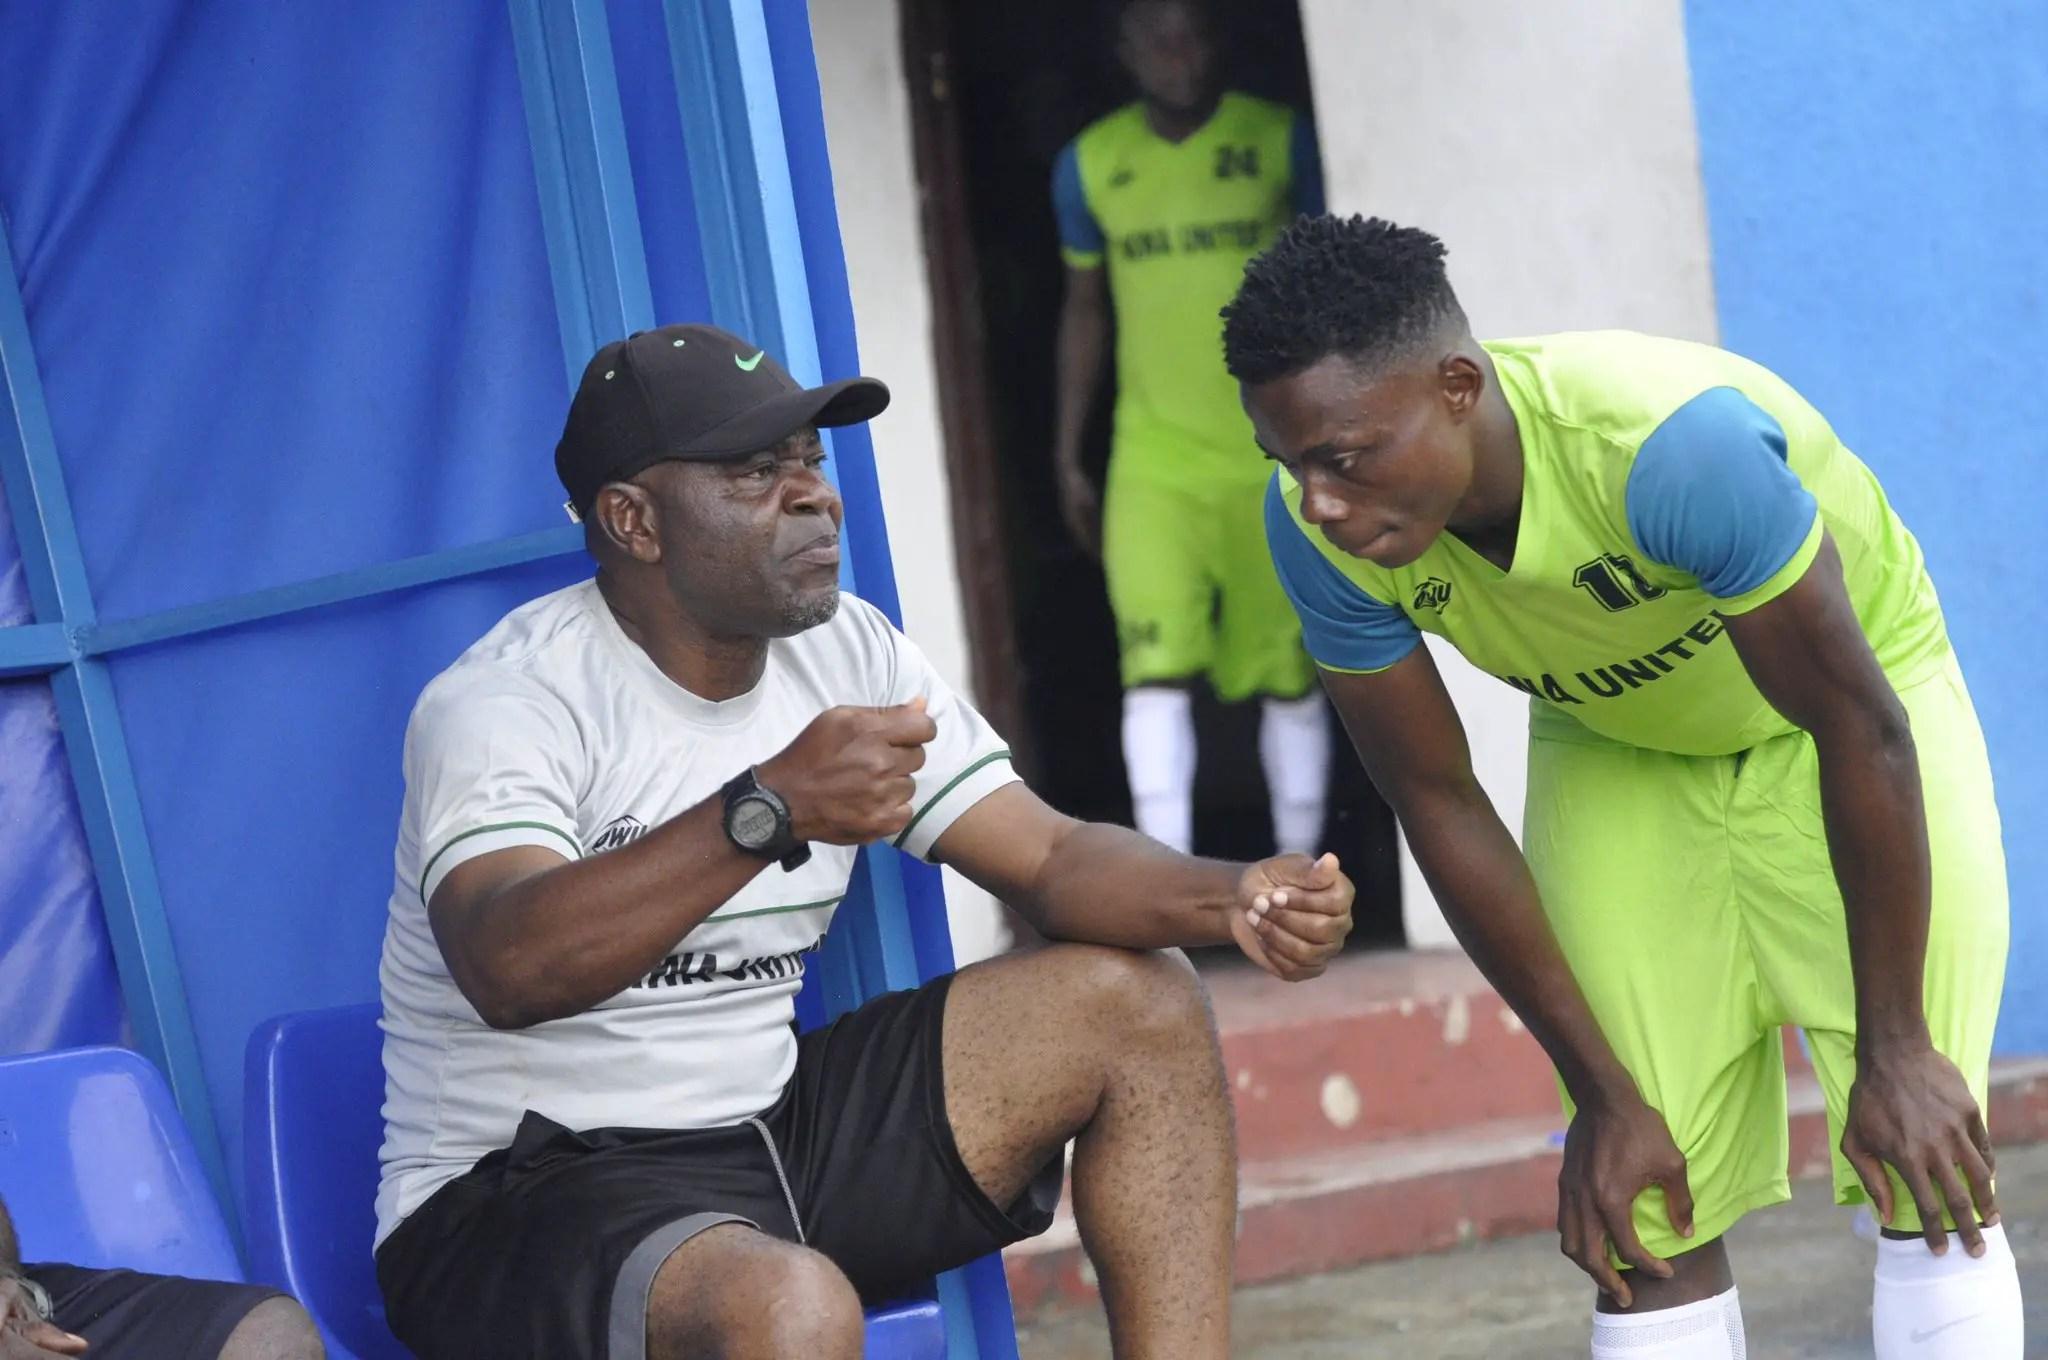 NPFL: Obuh Targets First Win As Akwa United Coach At Sunshine  Stars